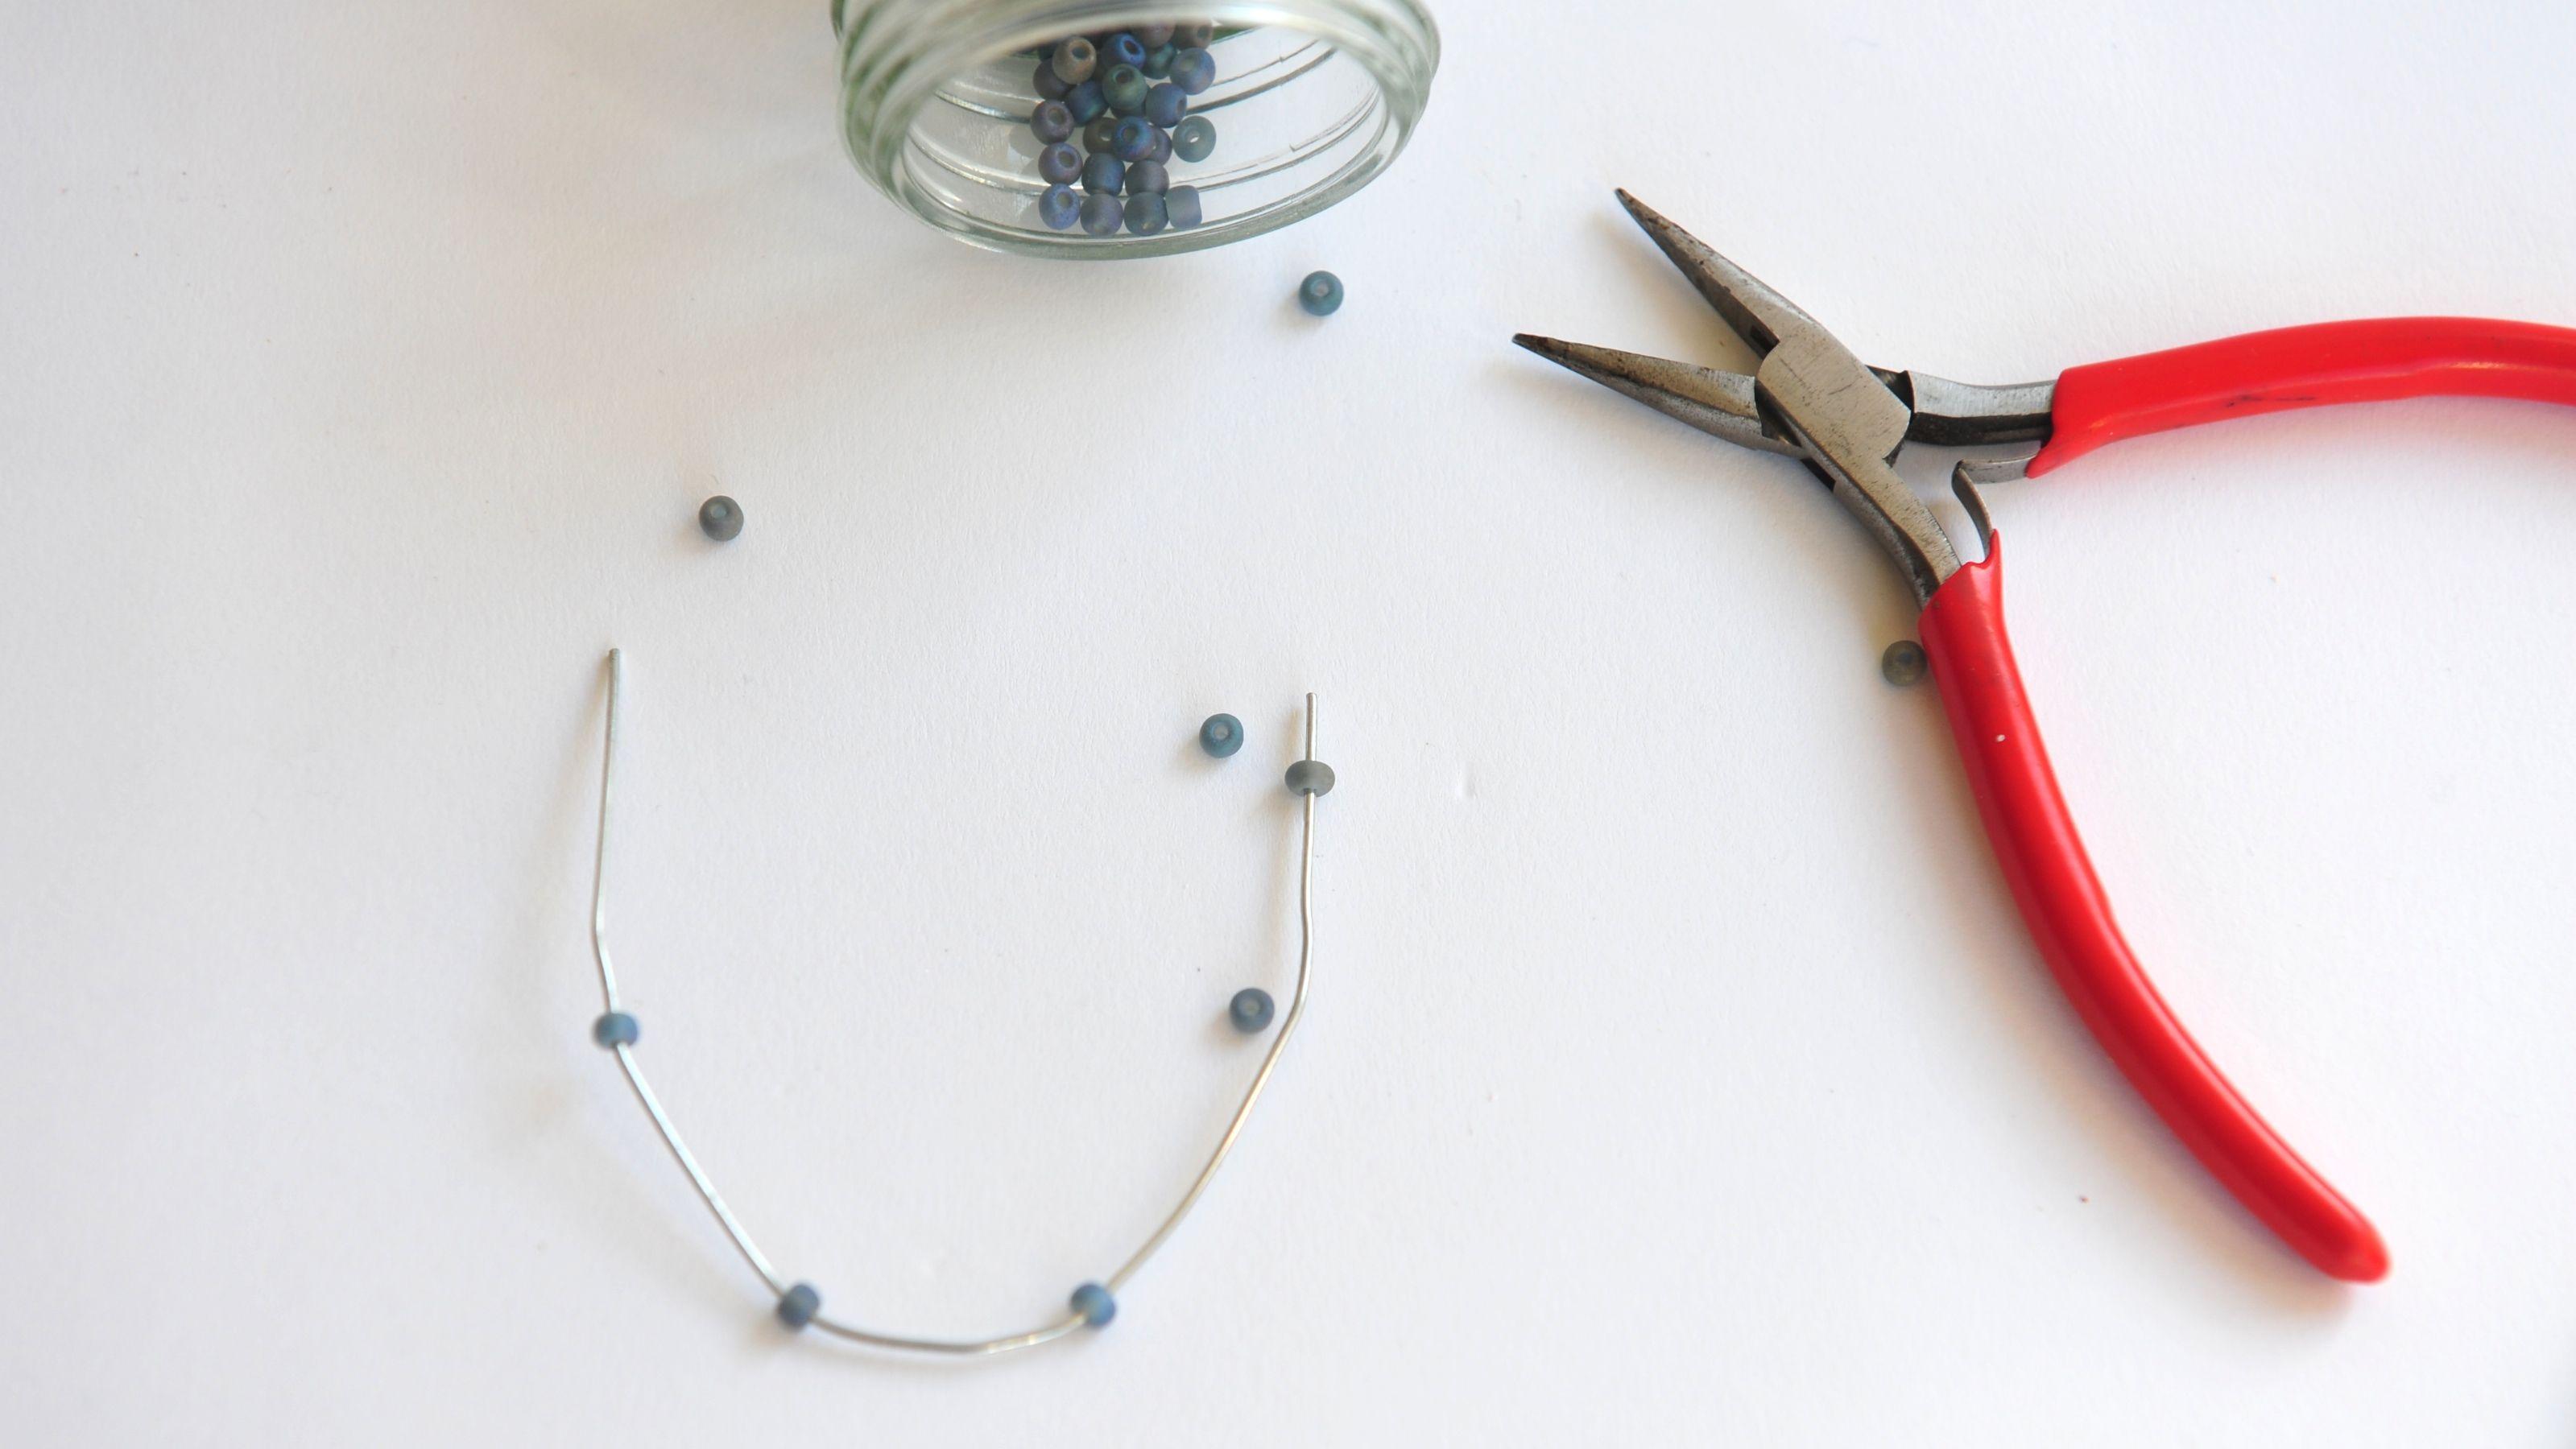 How to make fake braces fake braces nerd costumes diy